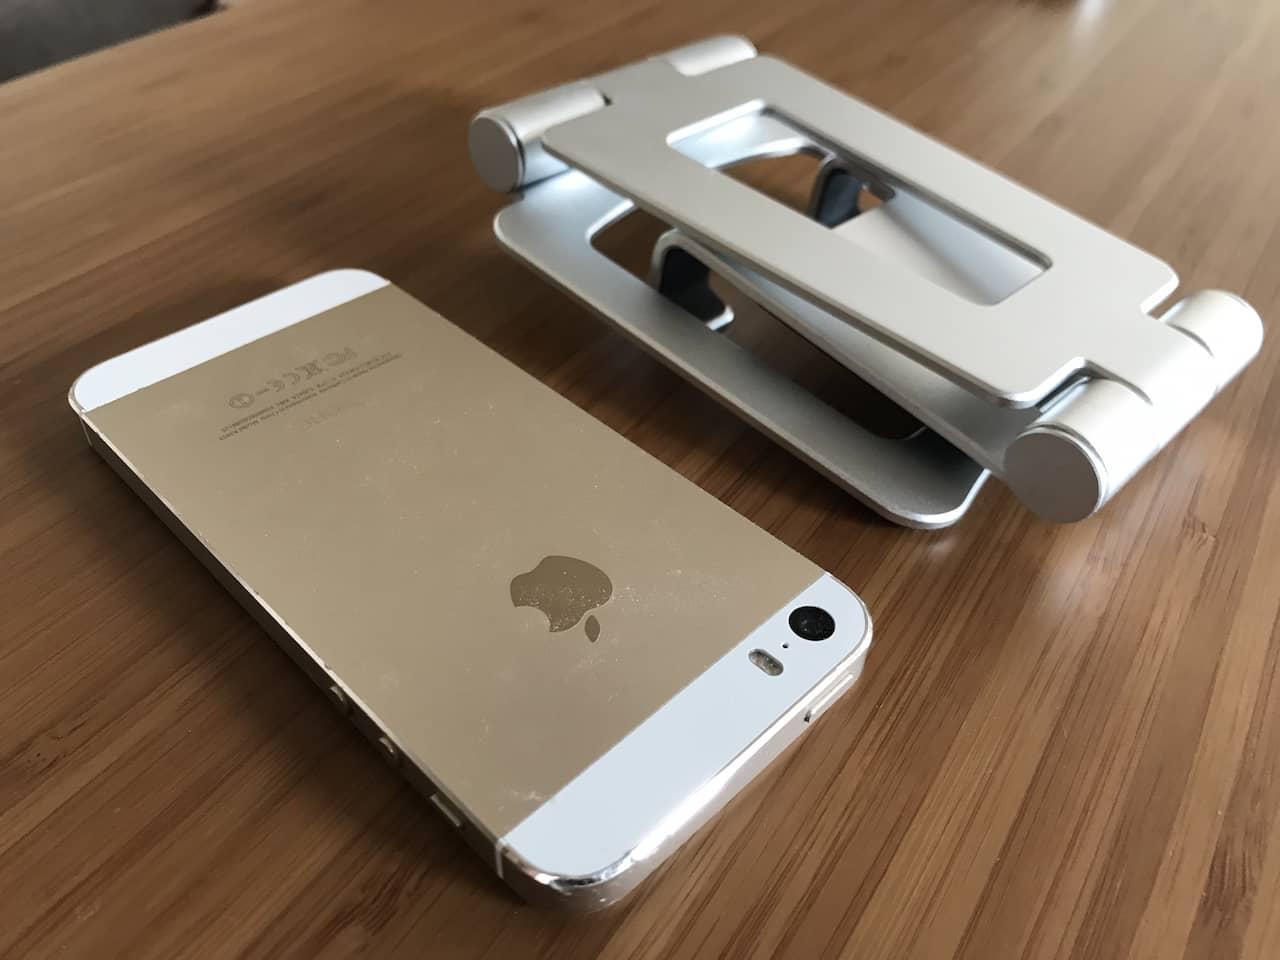 iPhone 5sと同じくらいの大きさに折り畳まれたシルバーのタブレットスタンドです。